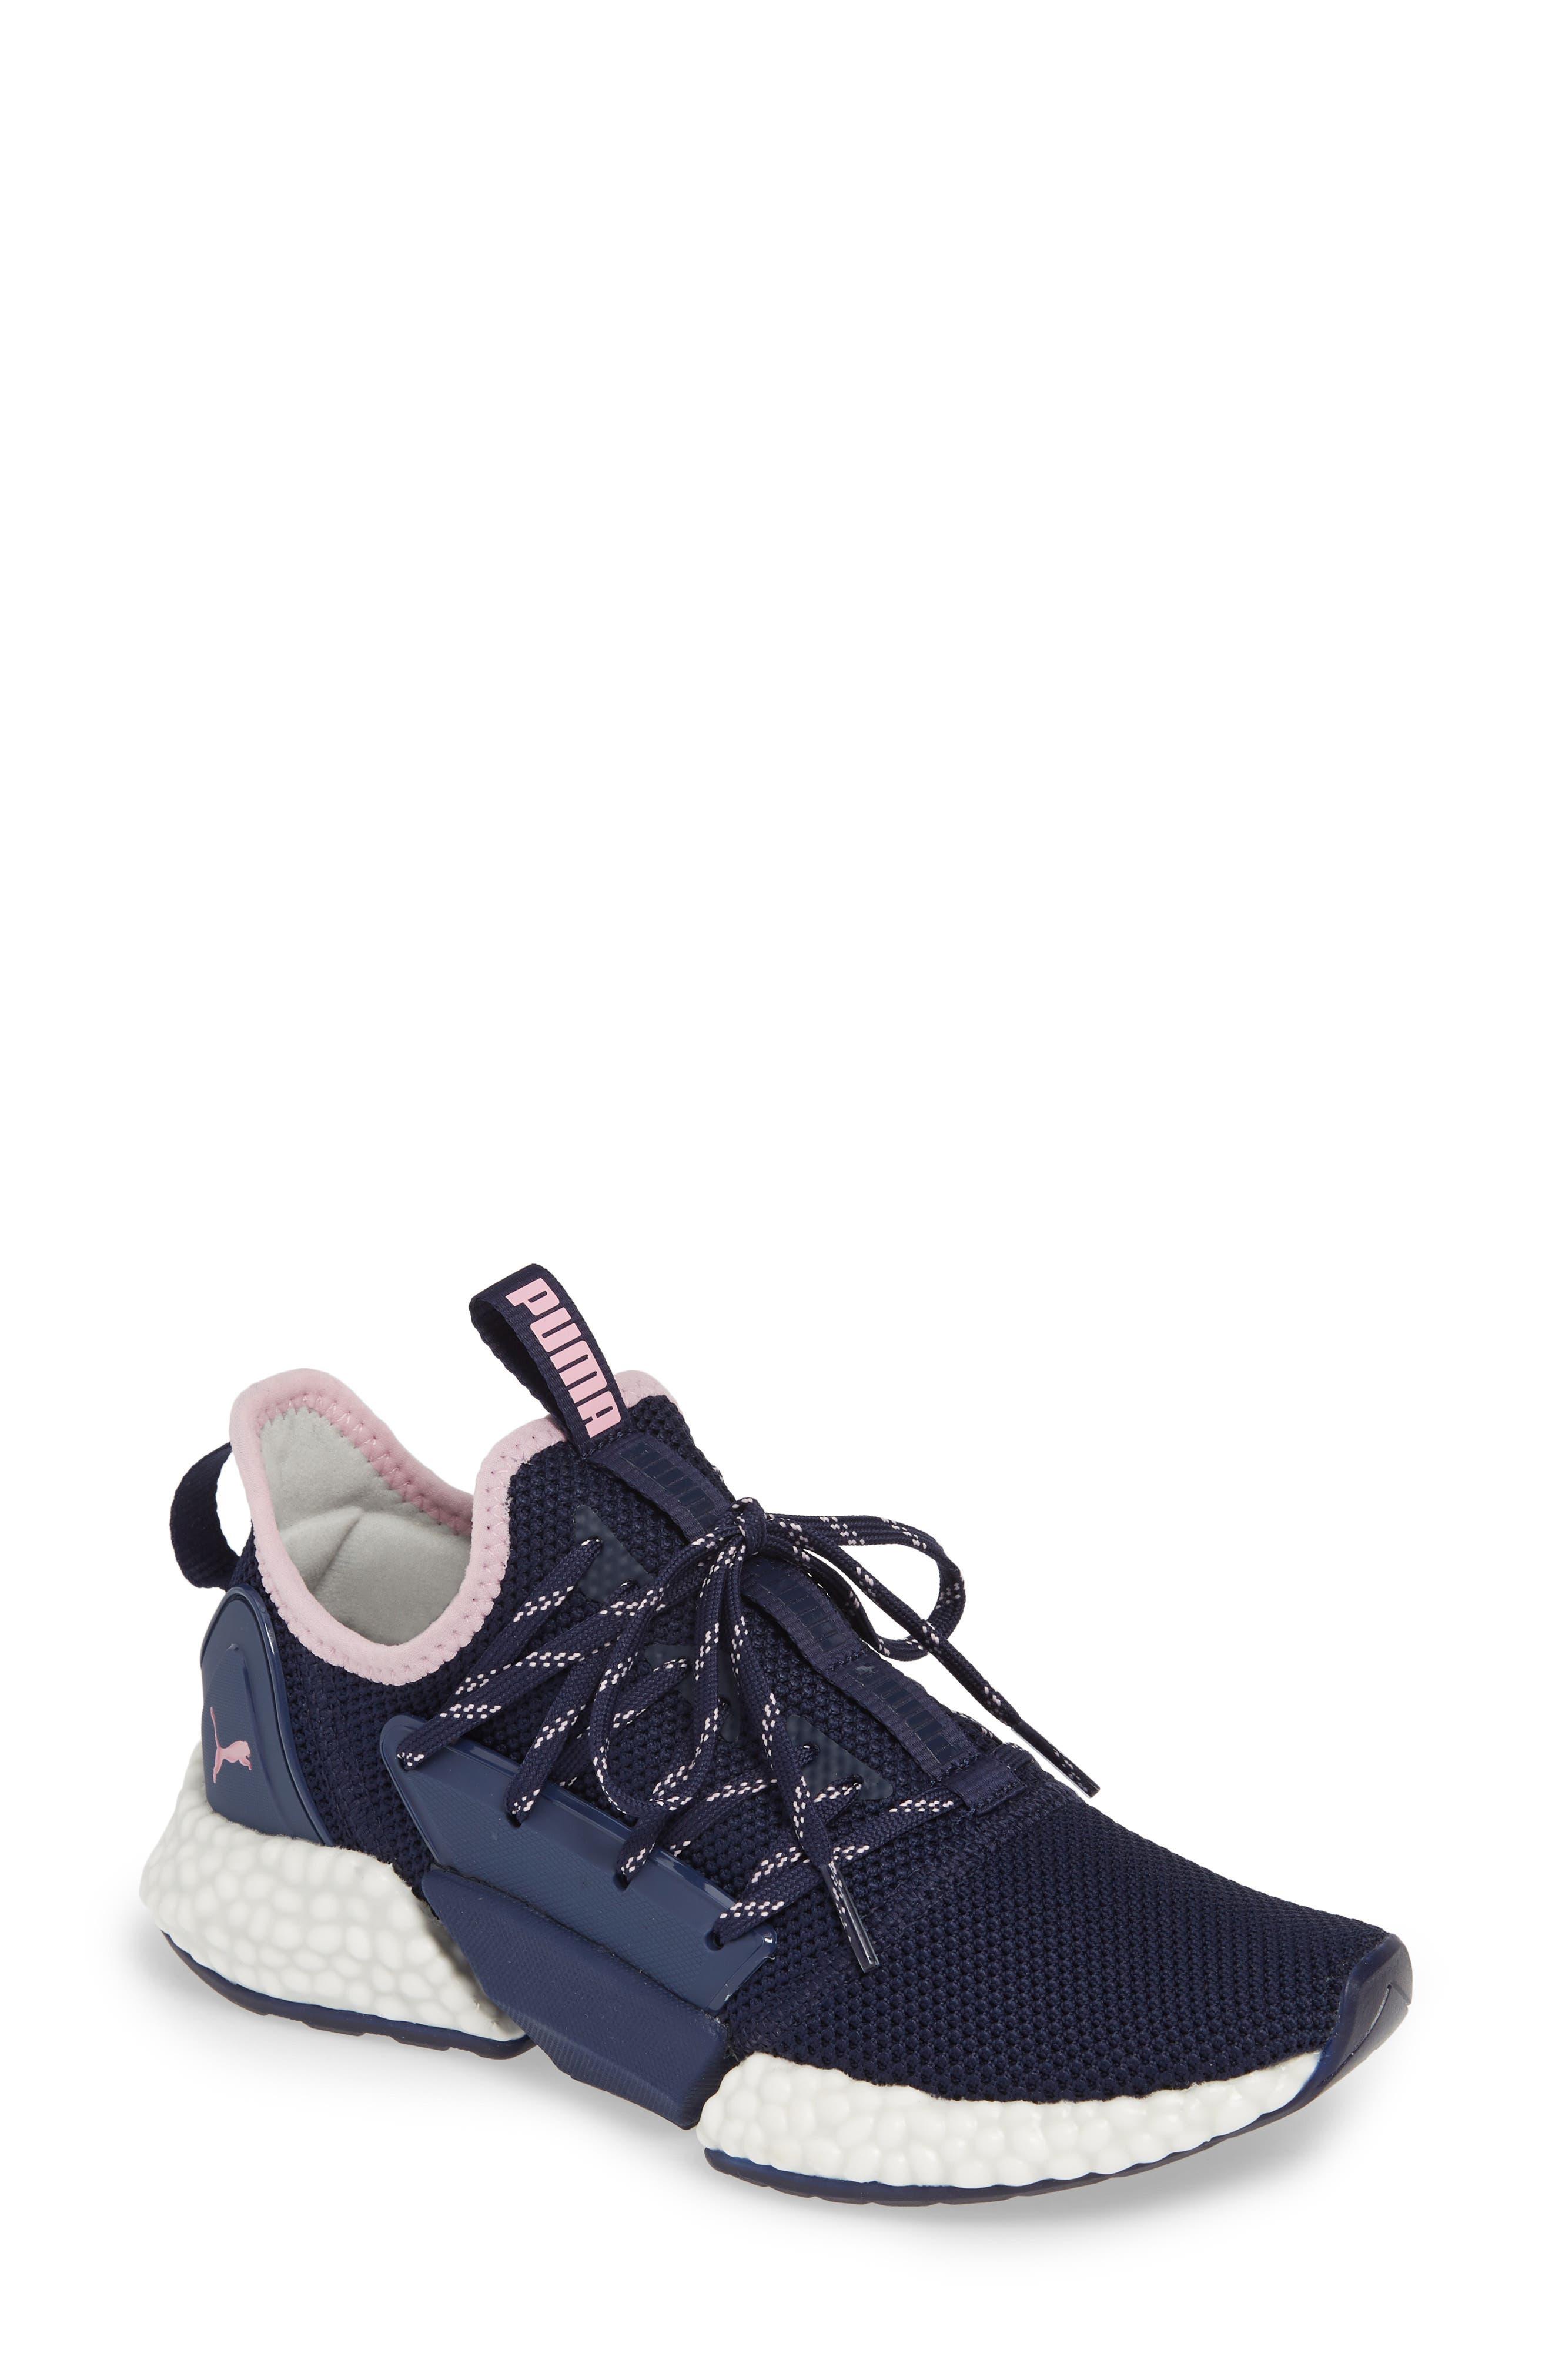 09af3561a78 PUMA Shoes for Women